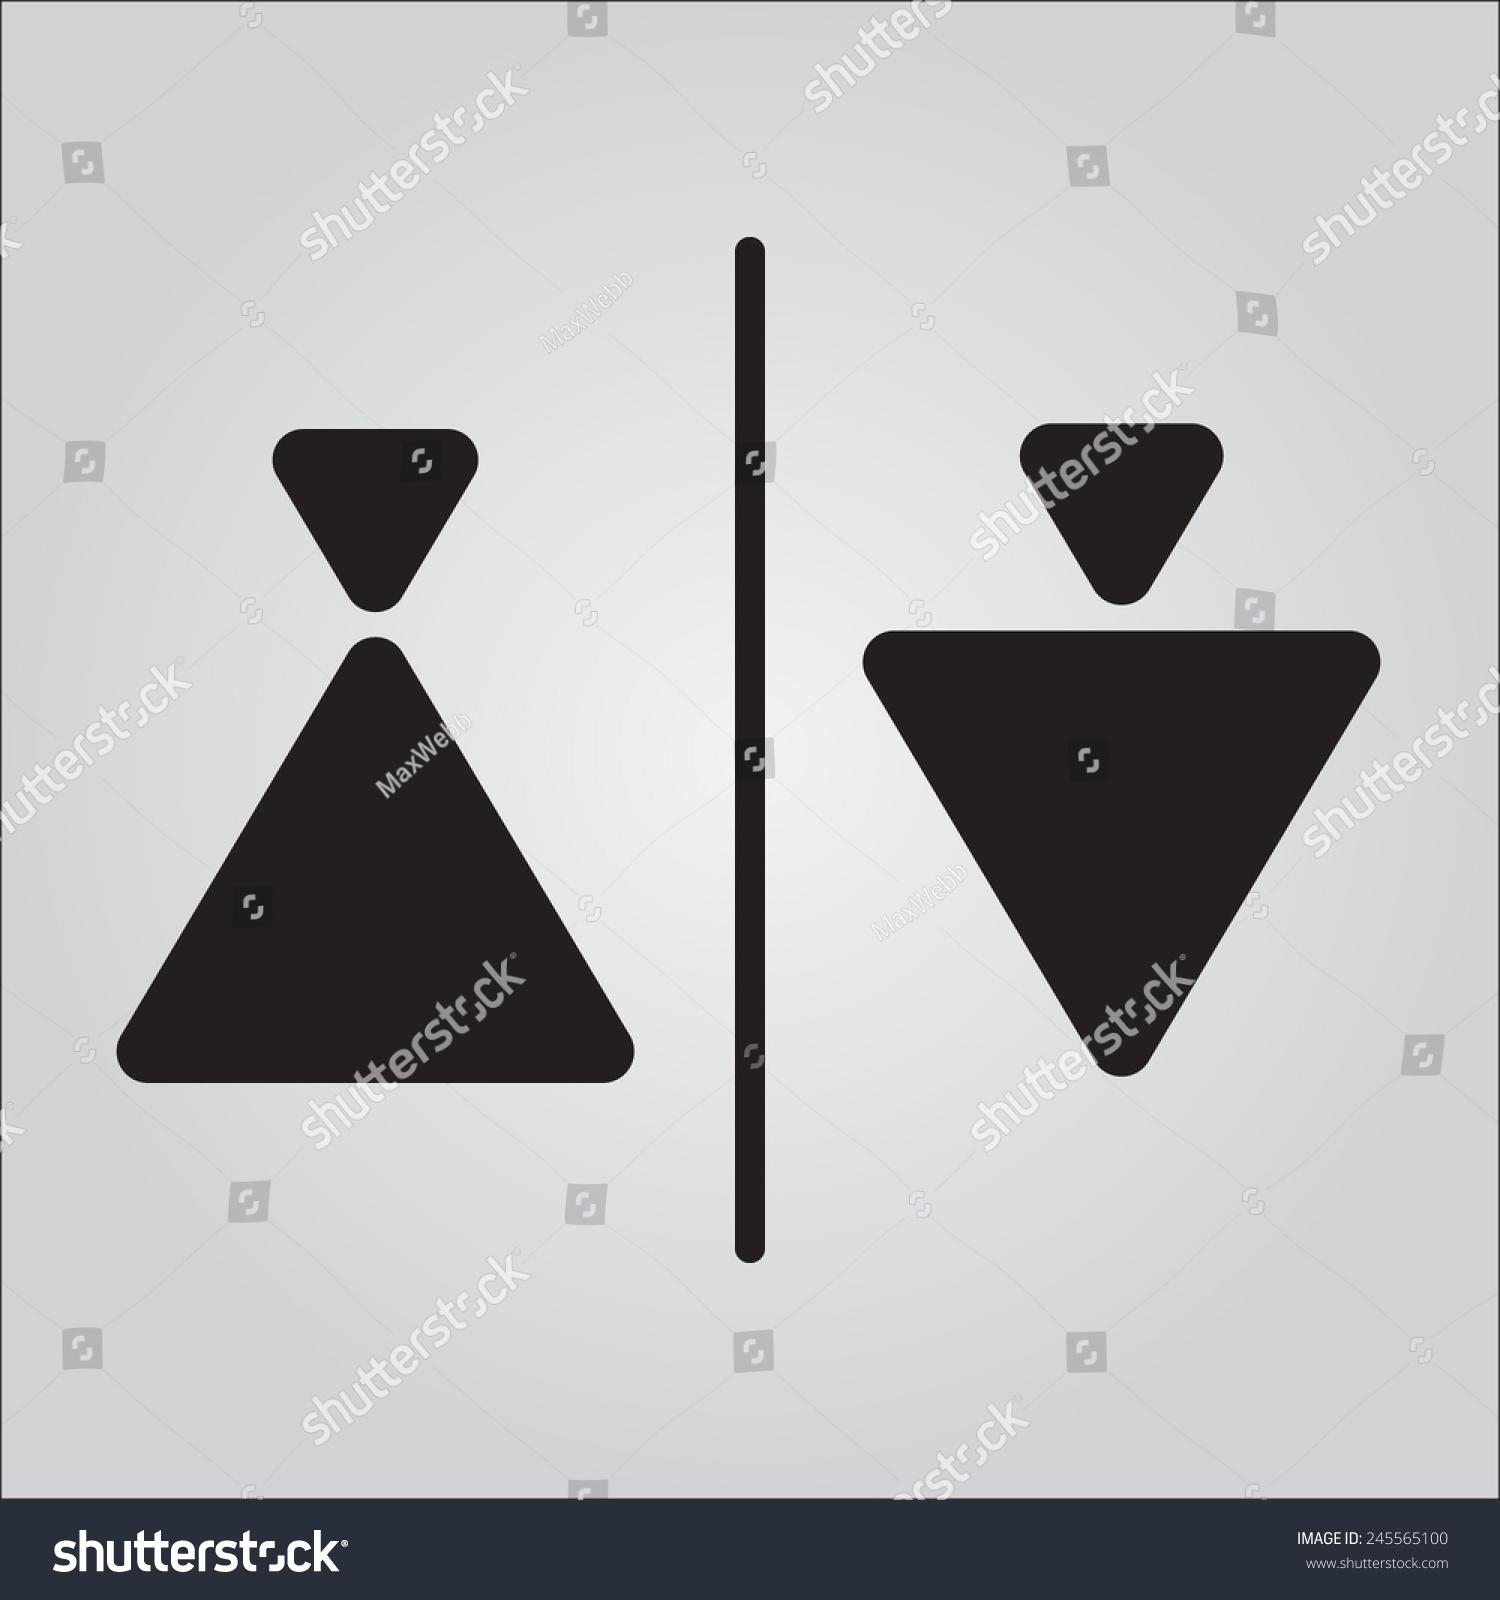 Vector Triangle Elements Sign Restroom 245565100 Shutterstock